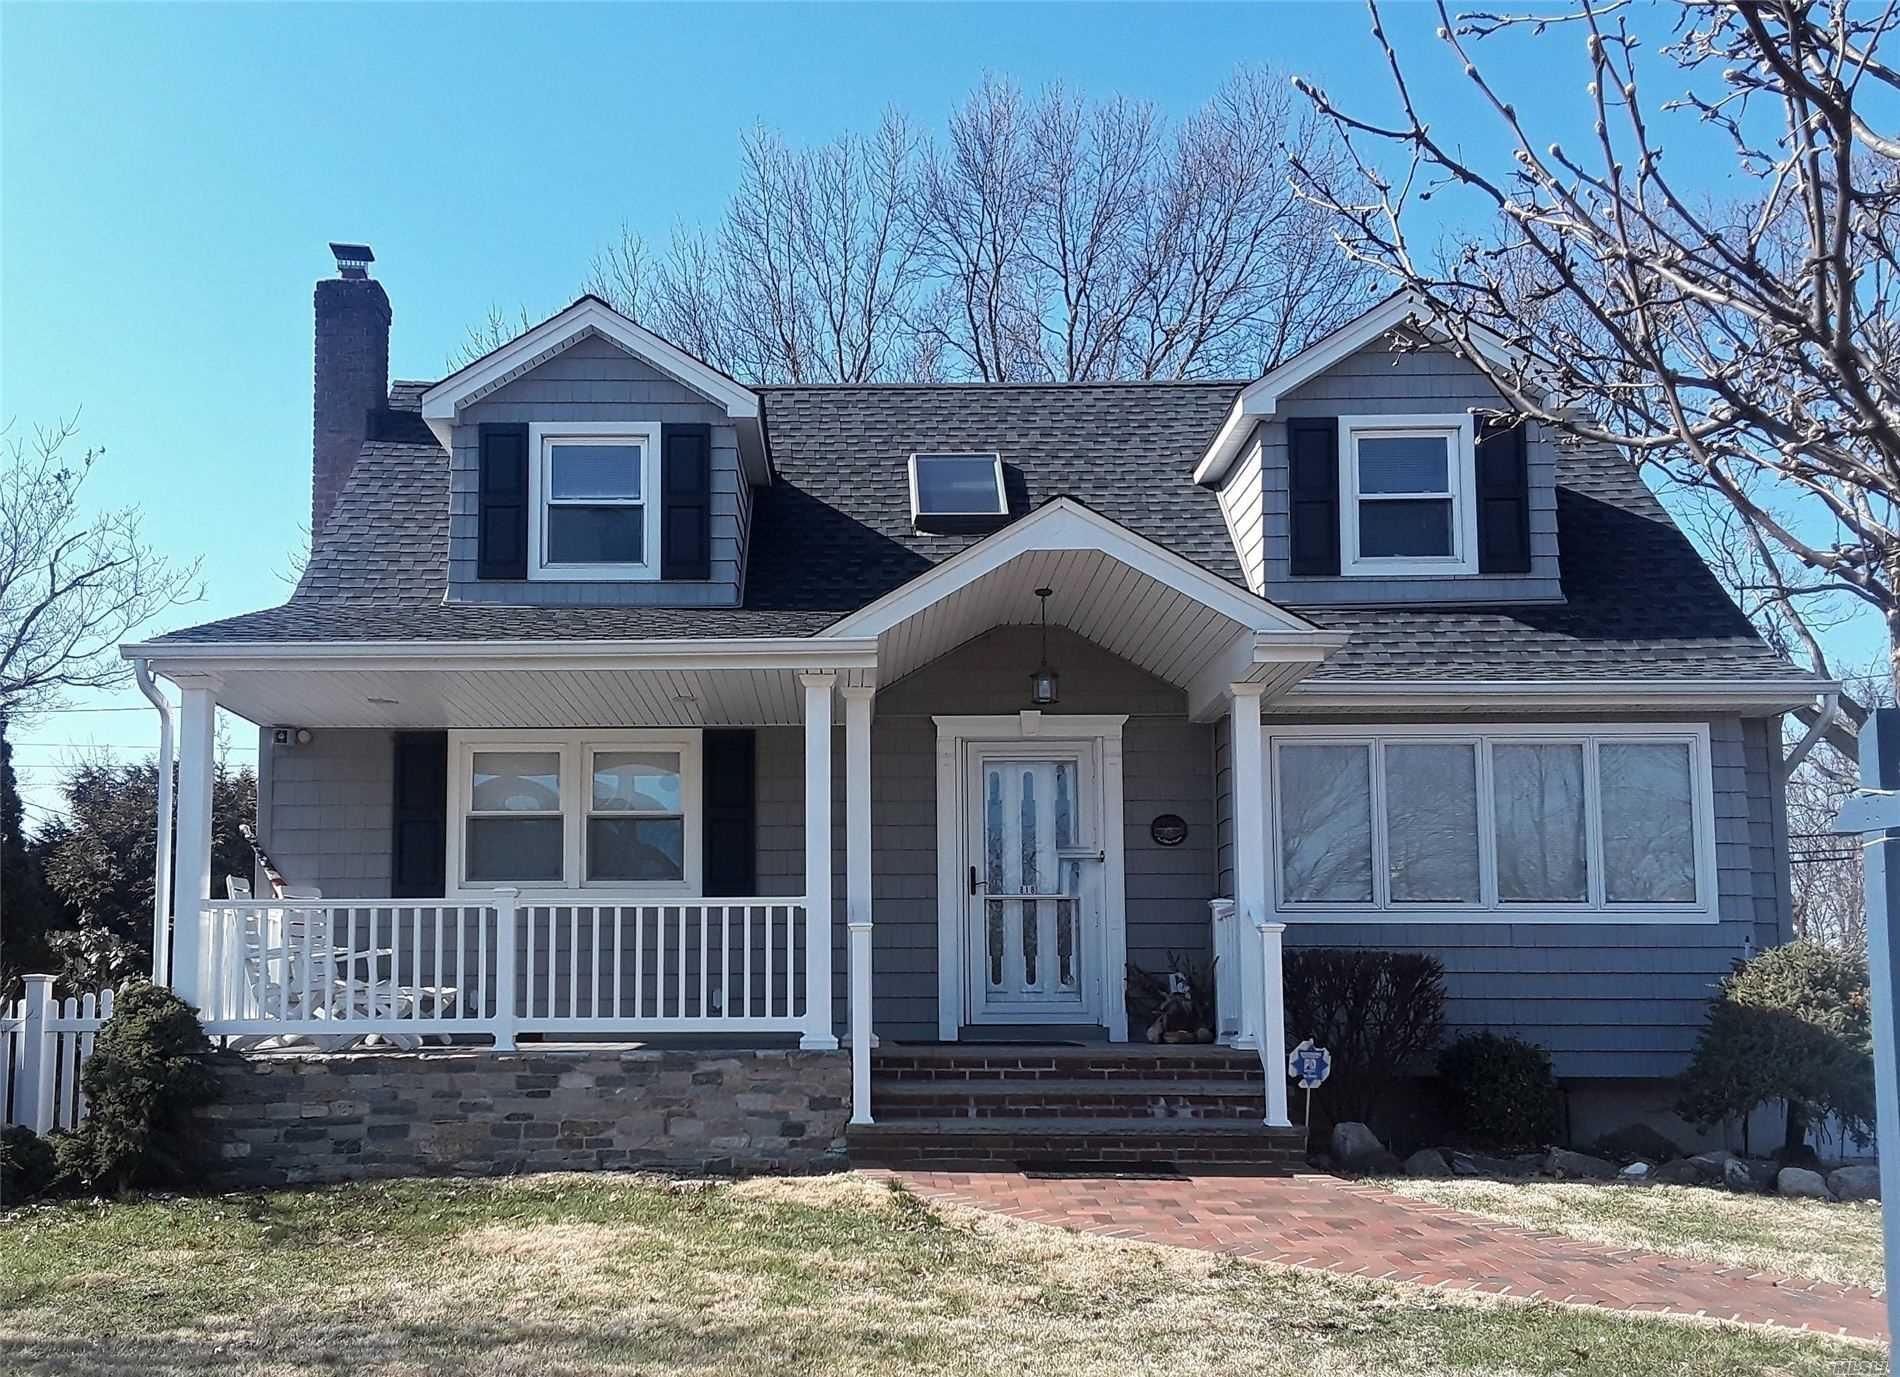 818 Pineneck Road, Seaford, NY 11783 - MLS#: 3186477